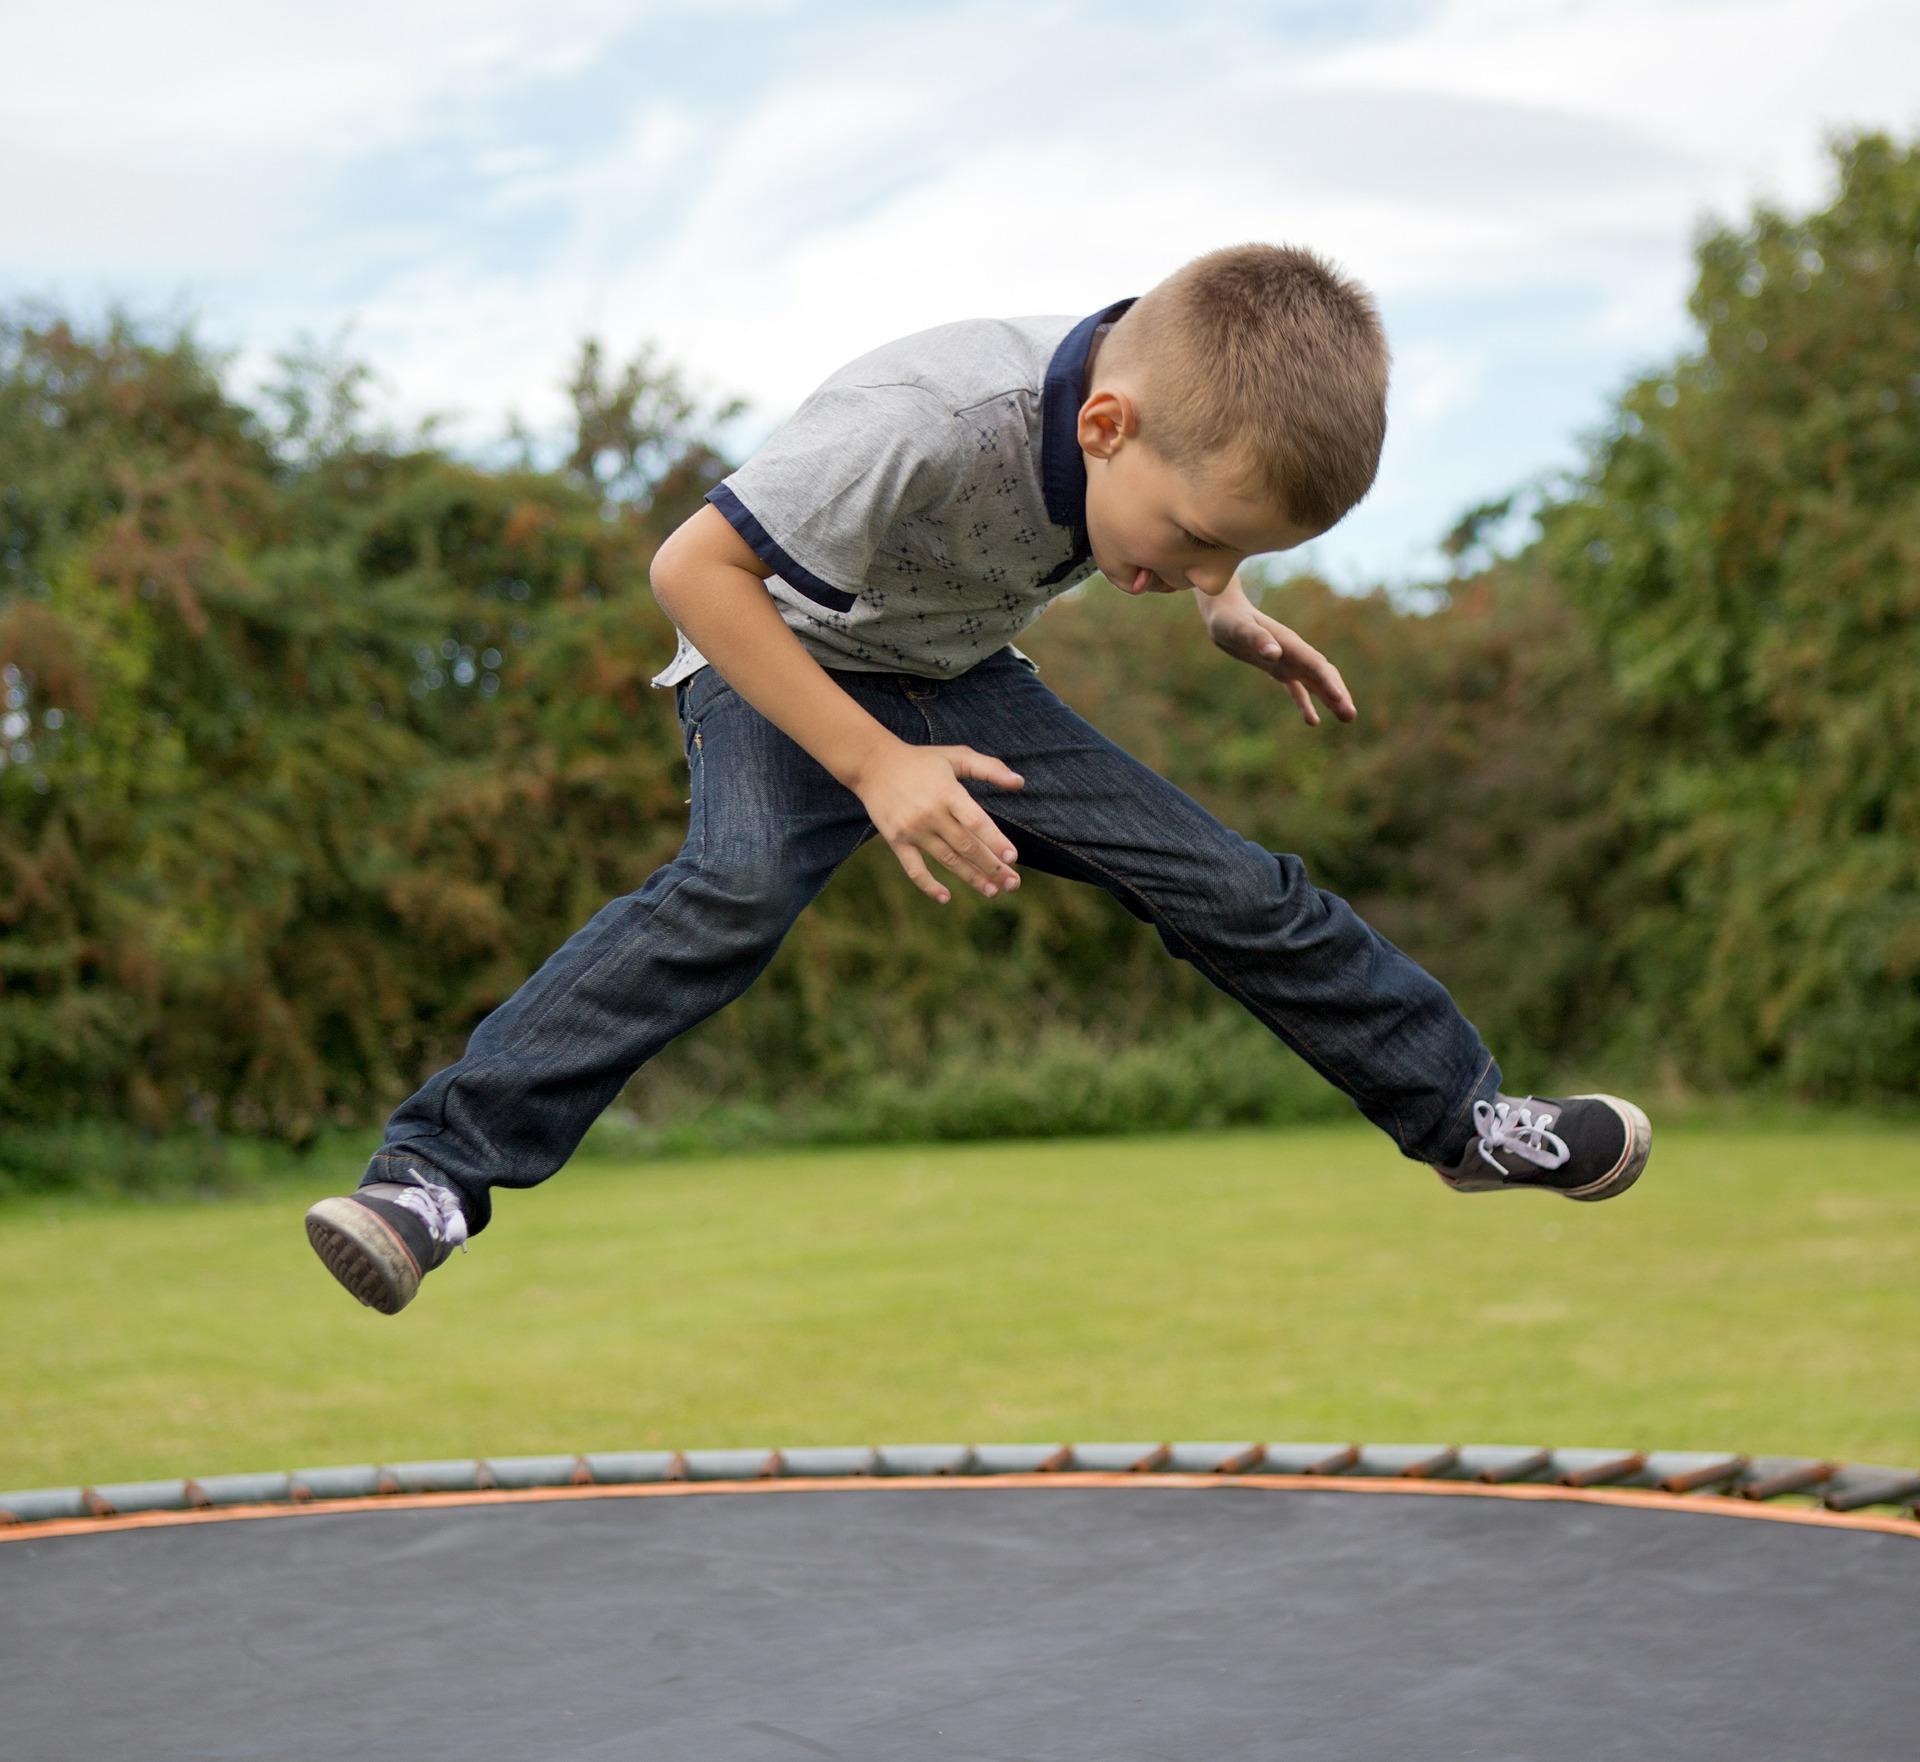 trampoline-436544_1920